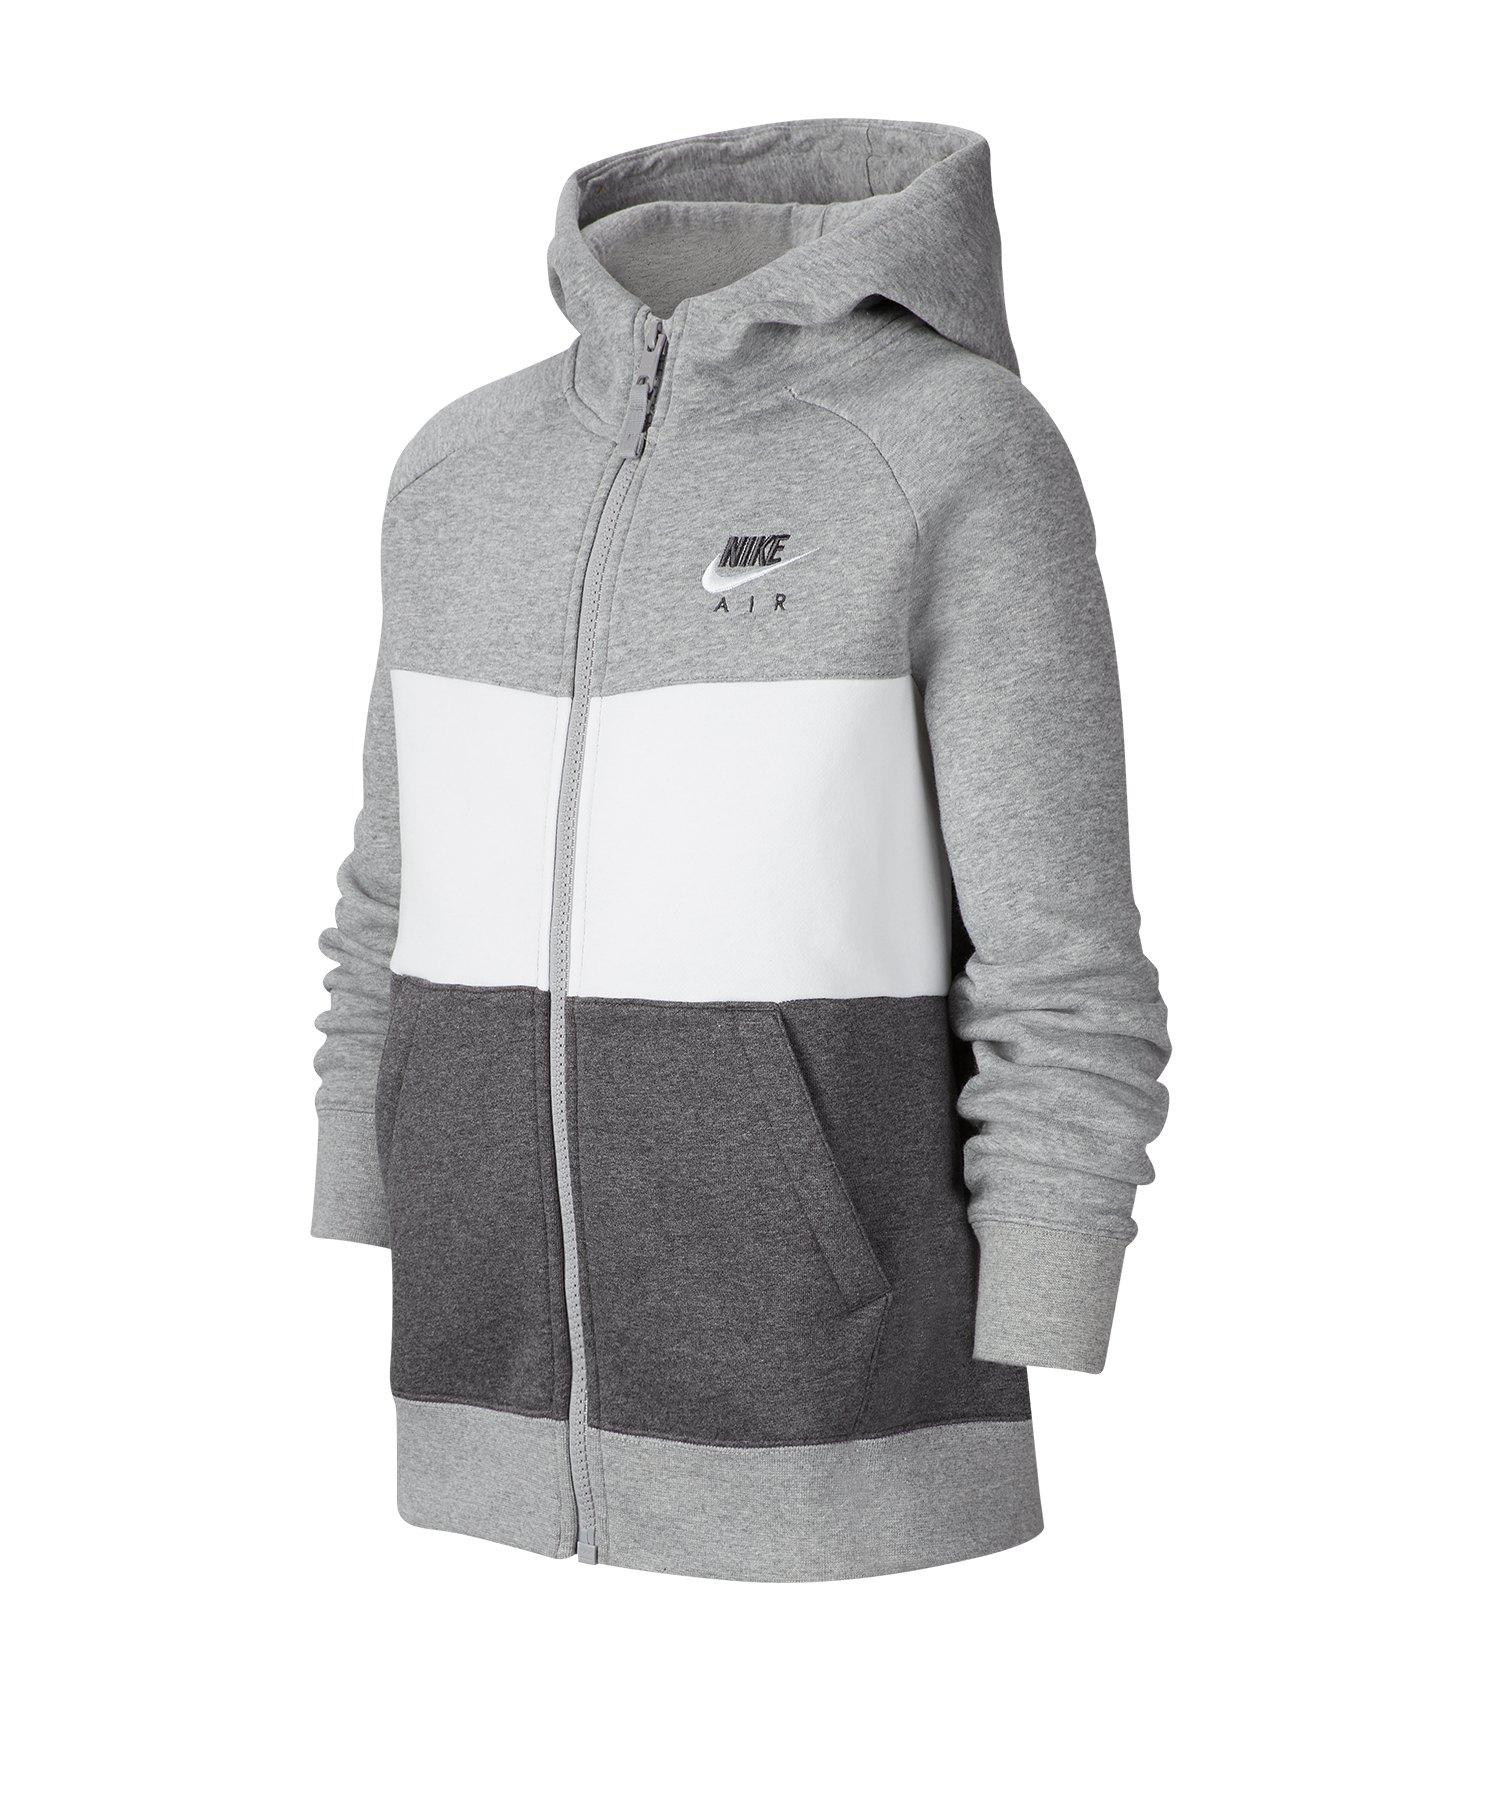 Nike Air Kapuzenjacke Kids Grau F063 - grau